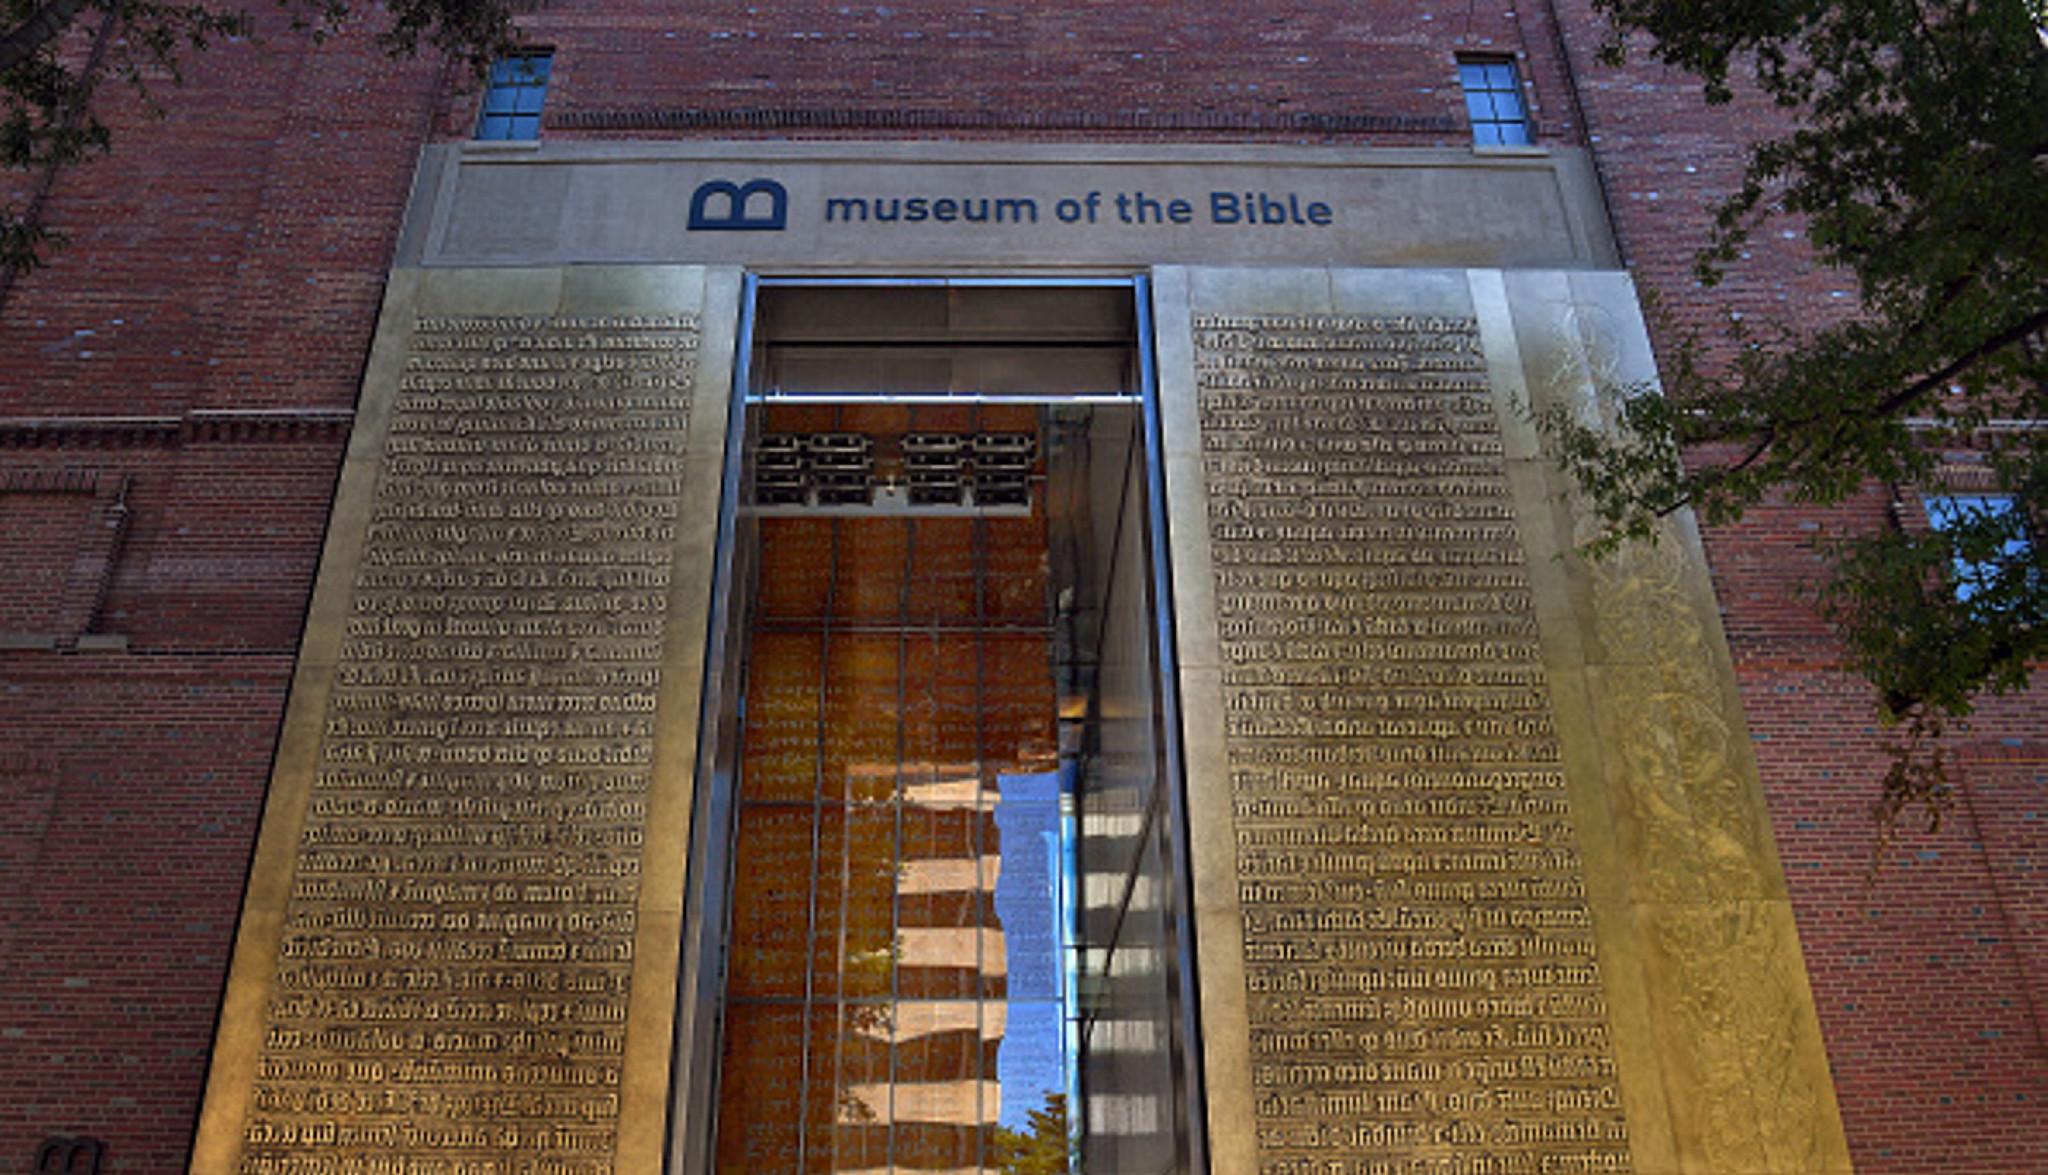 2048_museum of the bible washington 862232402.jpg